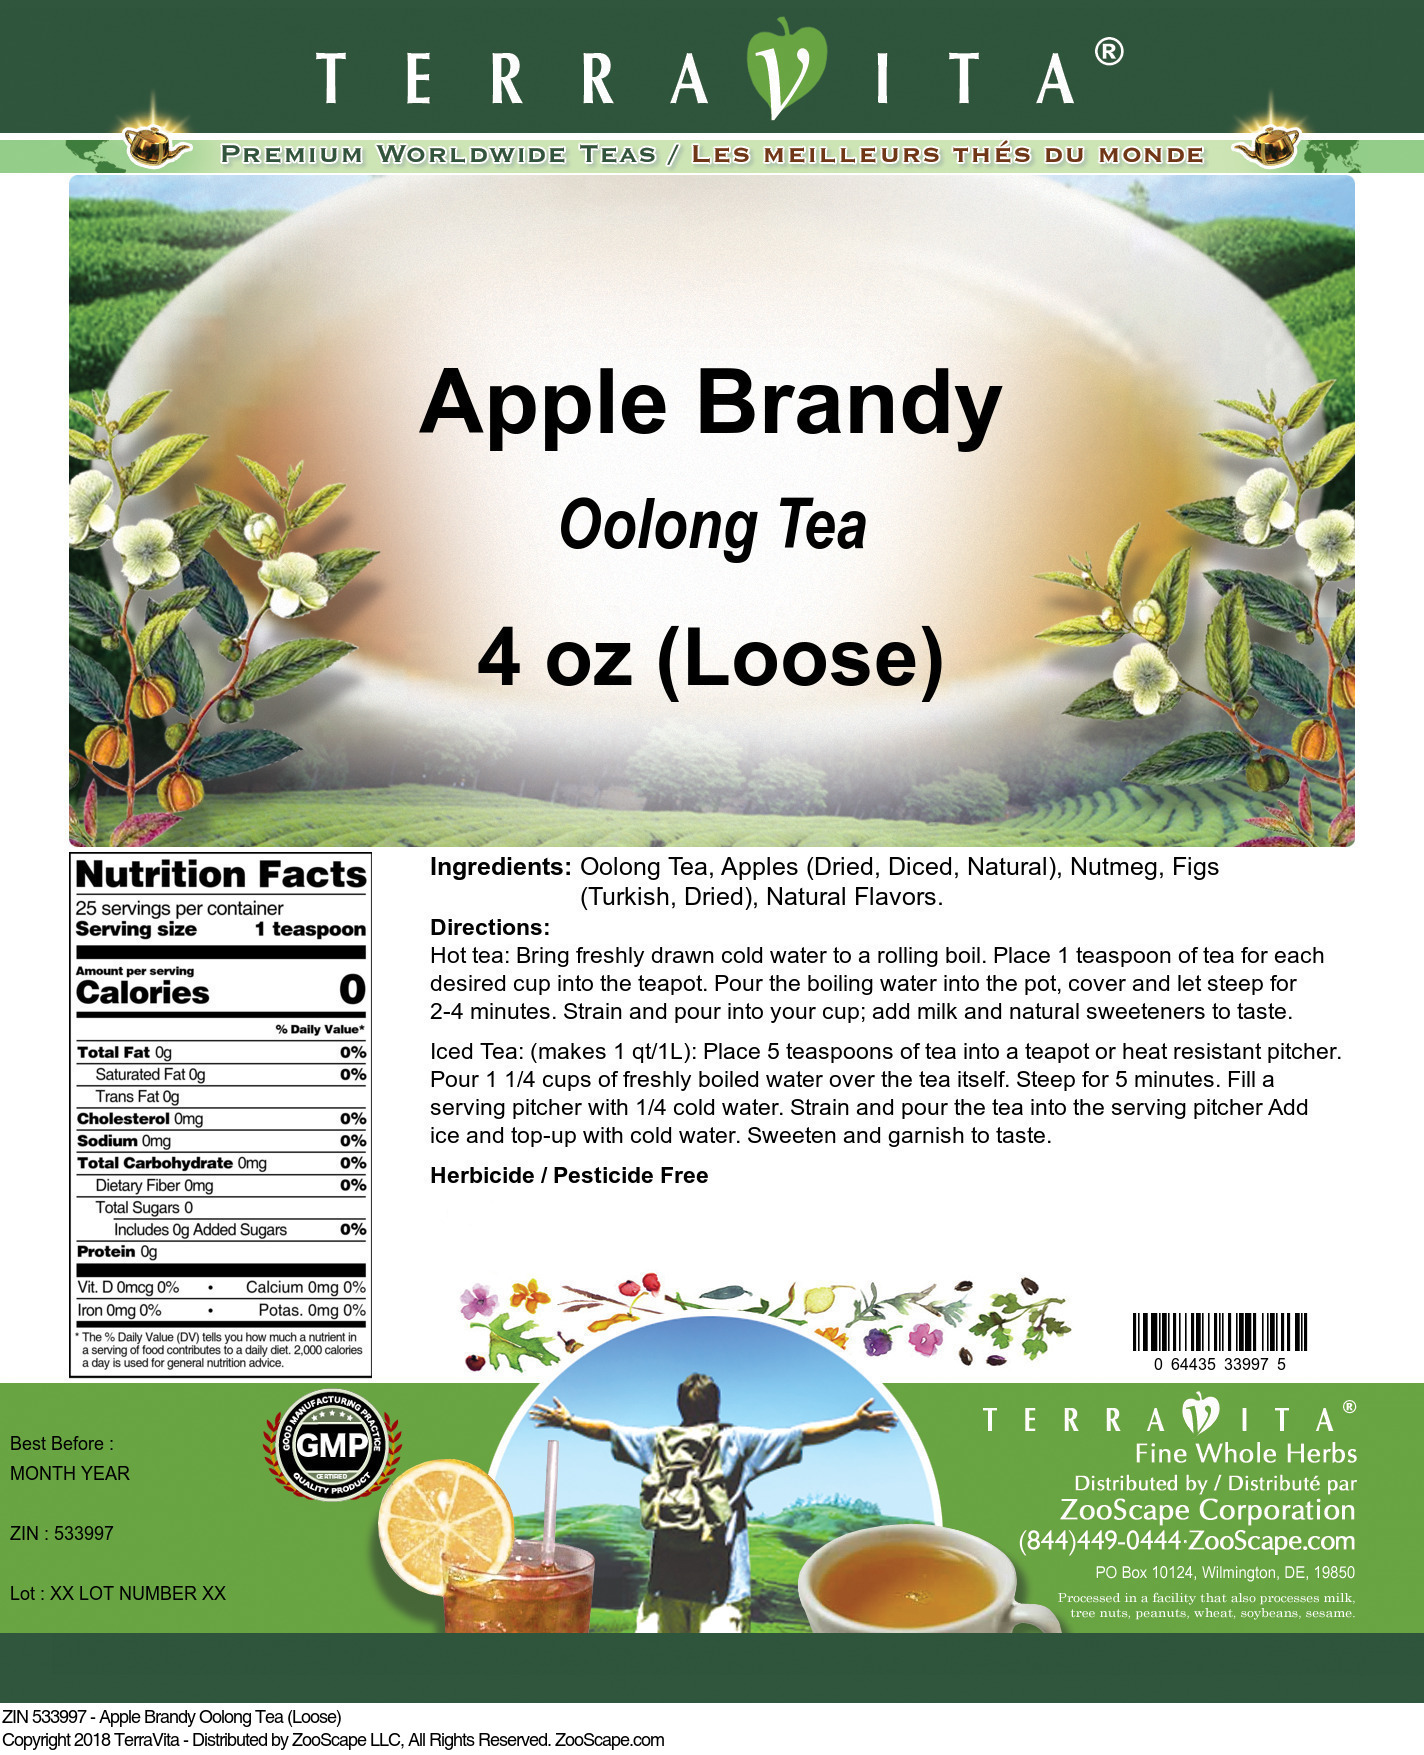 Apple Brandy Oolong Tea (Loose)